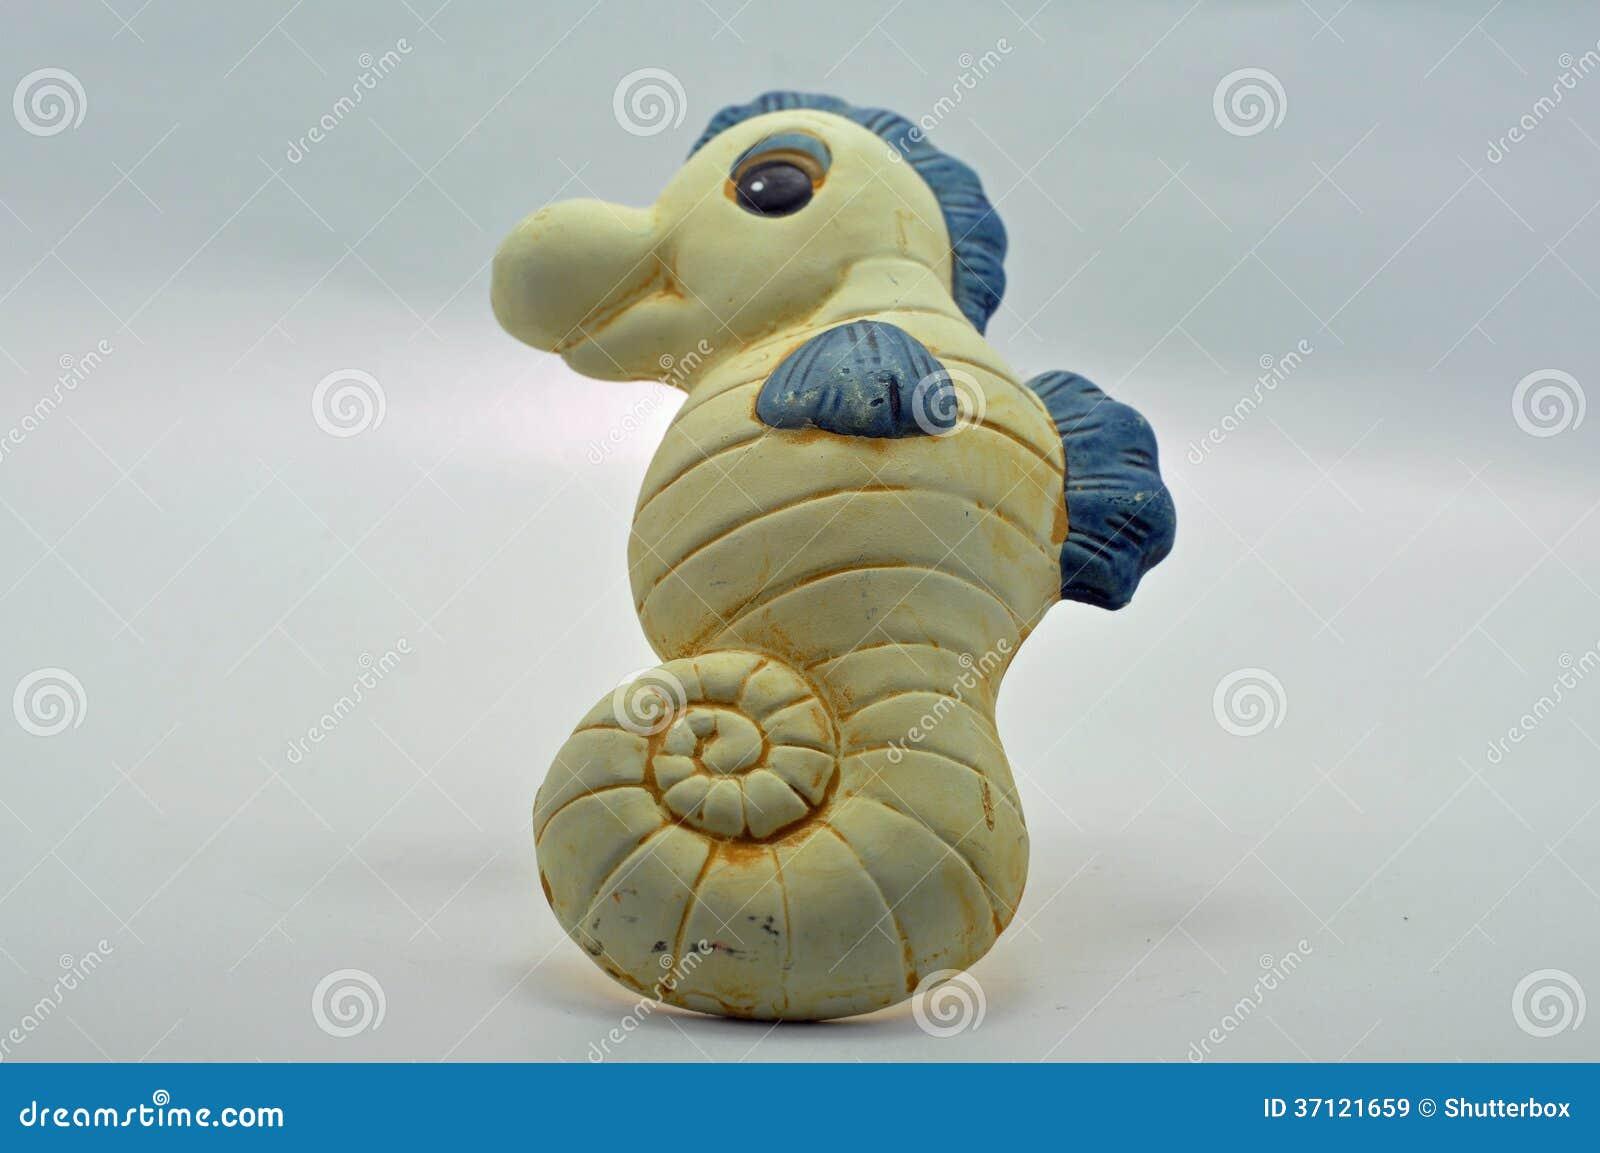 Sea Horse Ceramic Bathroom Ornament Stock Image Image Of Objects